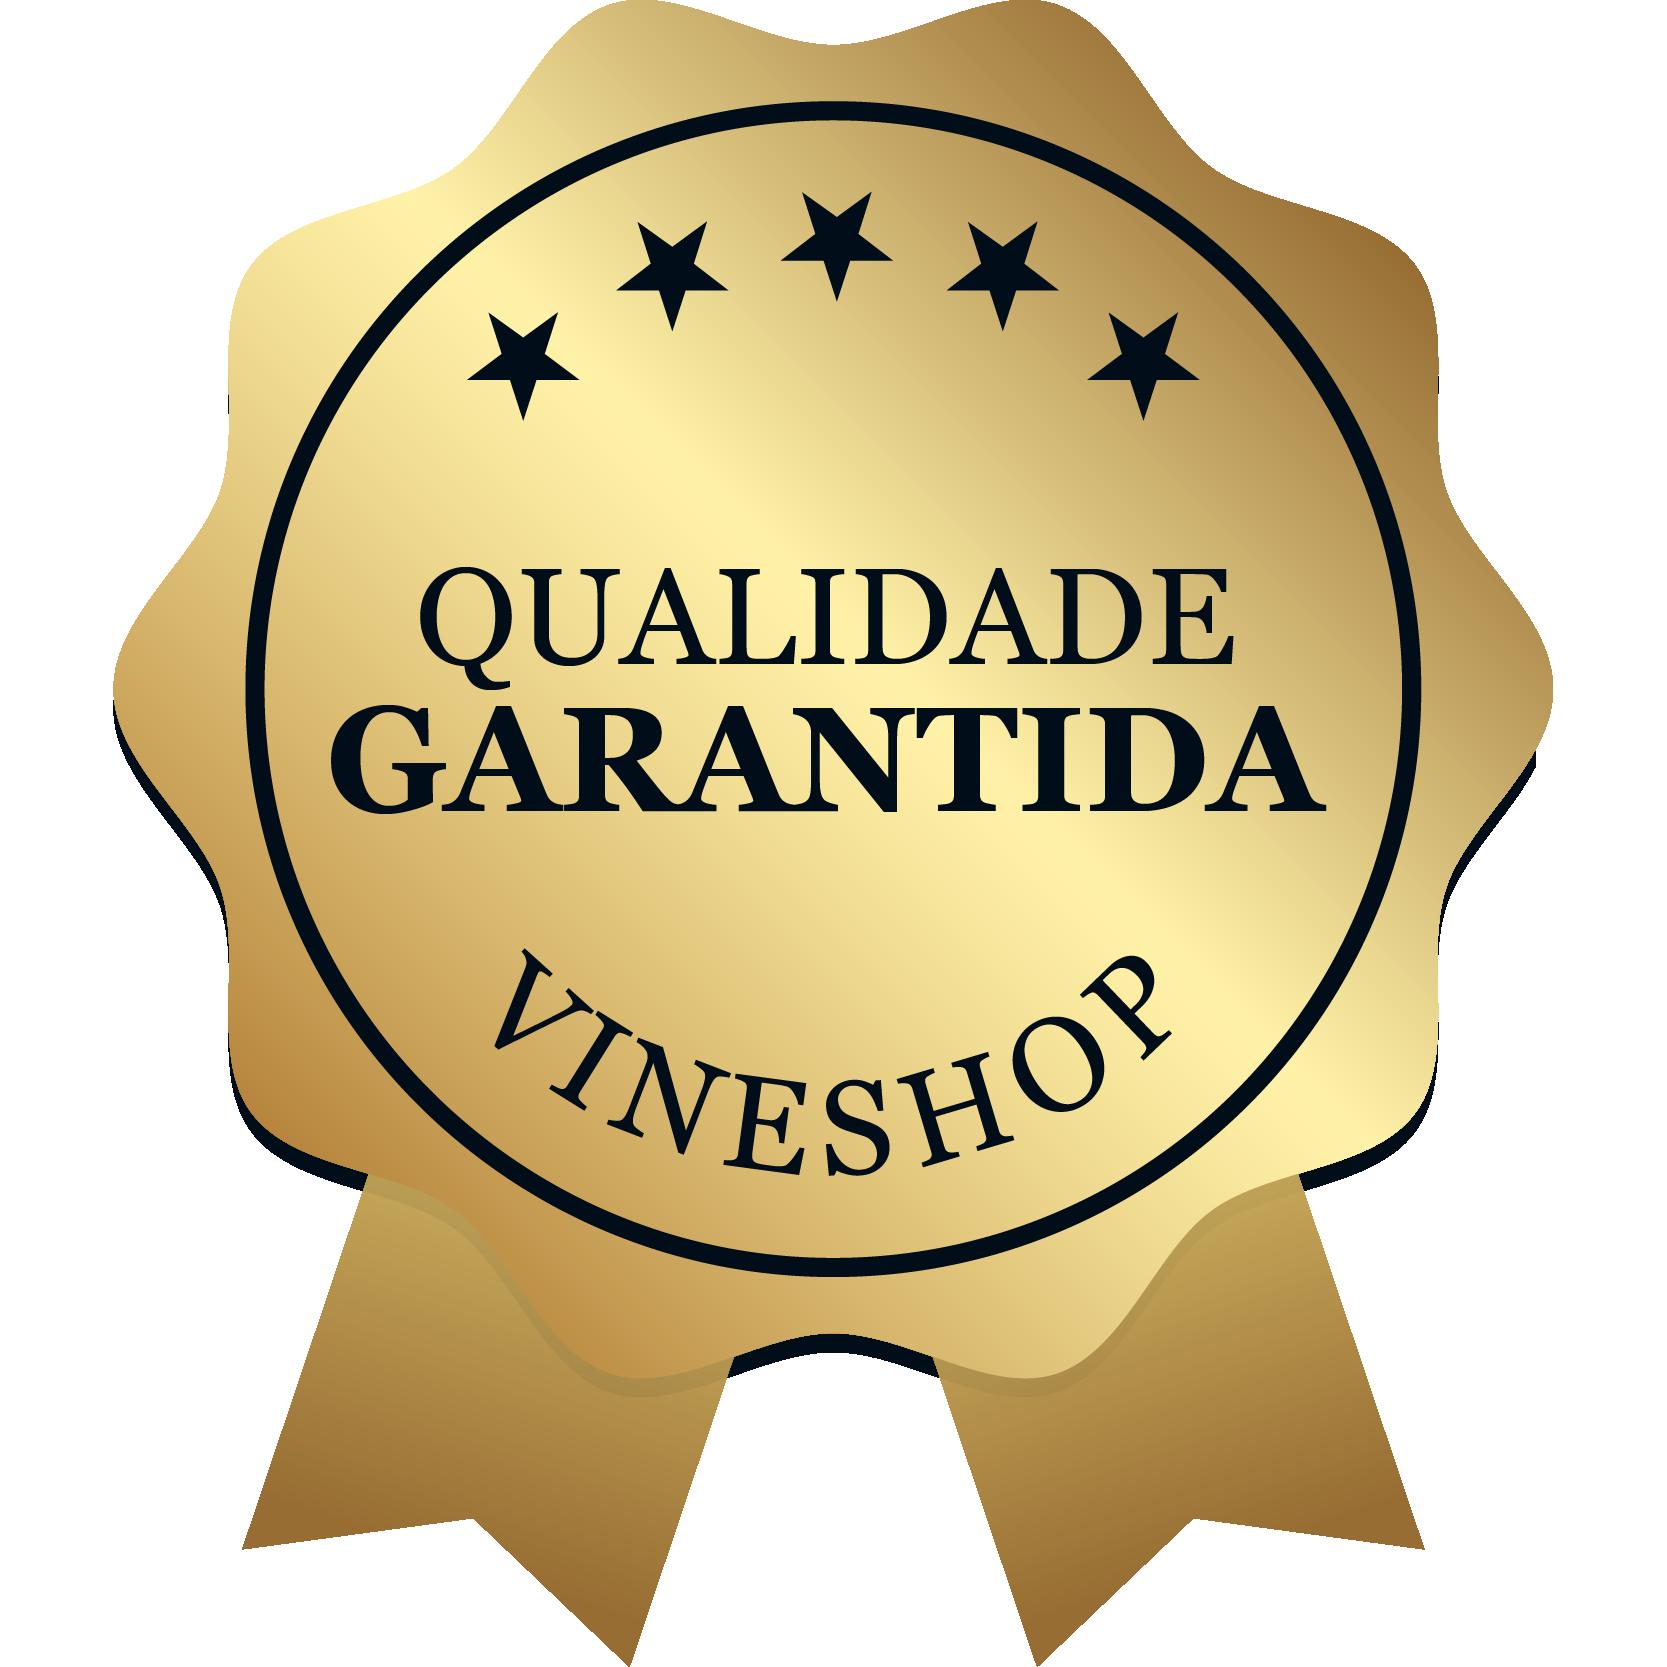 Qualidade Garantida Vineshop